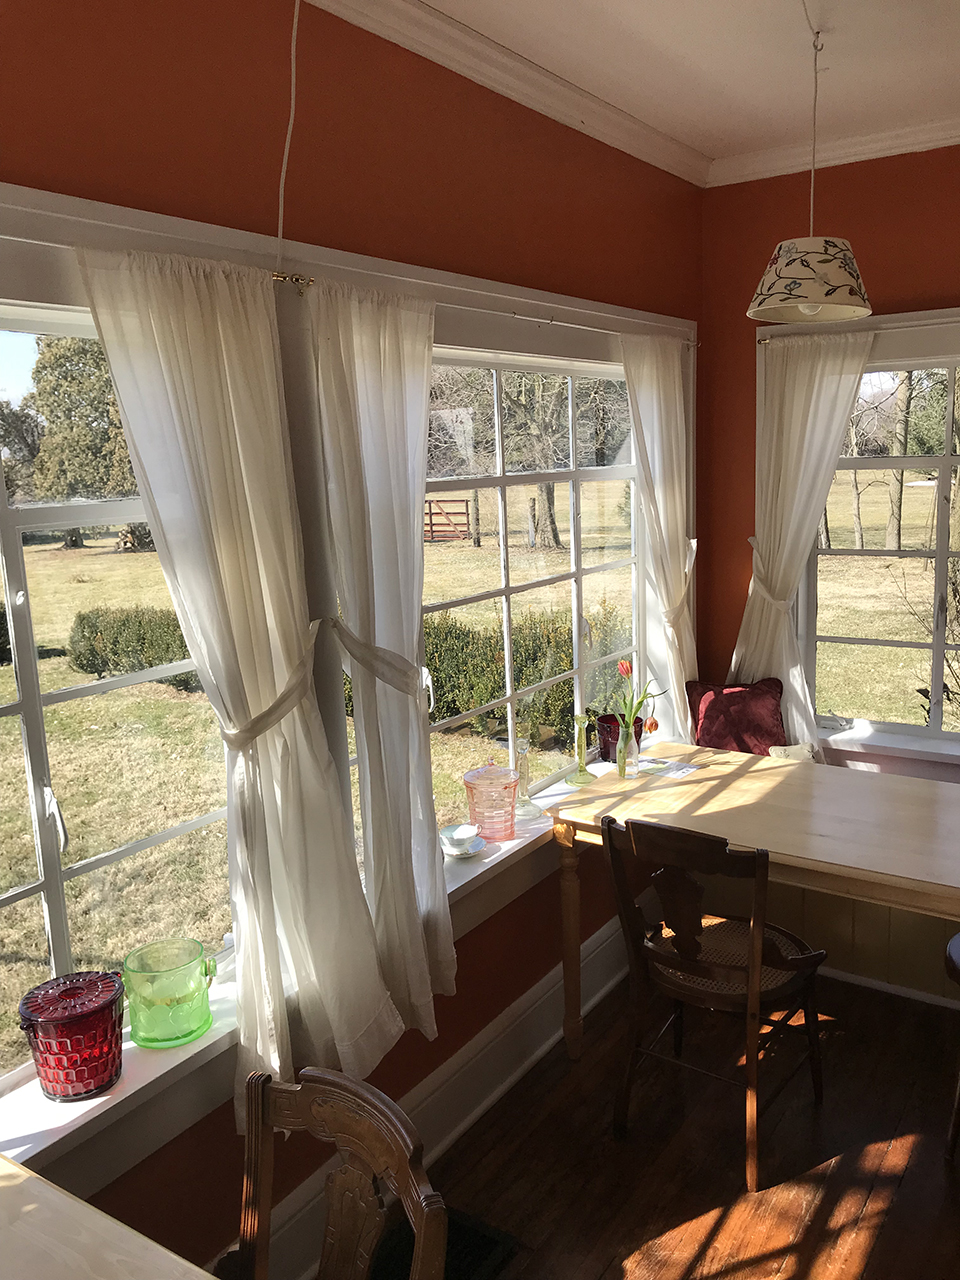 Orchard-house-boutique-hotel-breakfast-nook-metal-windows.jpg